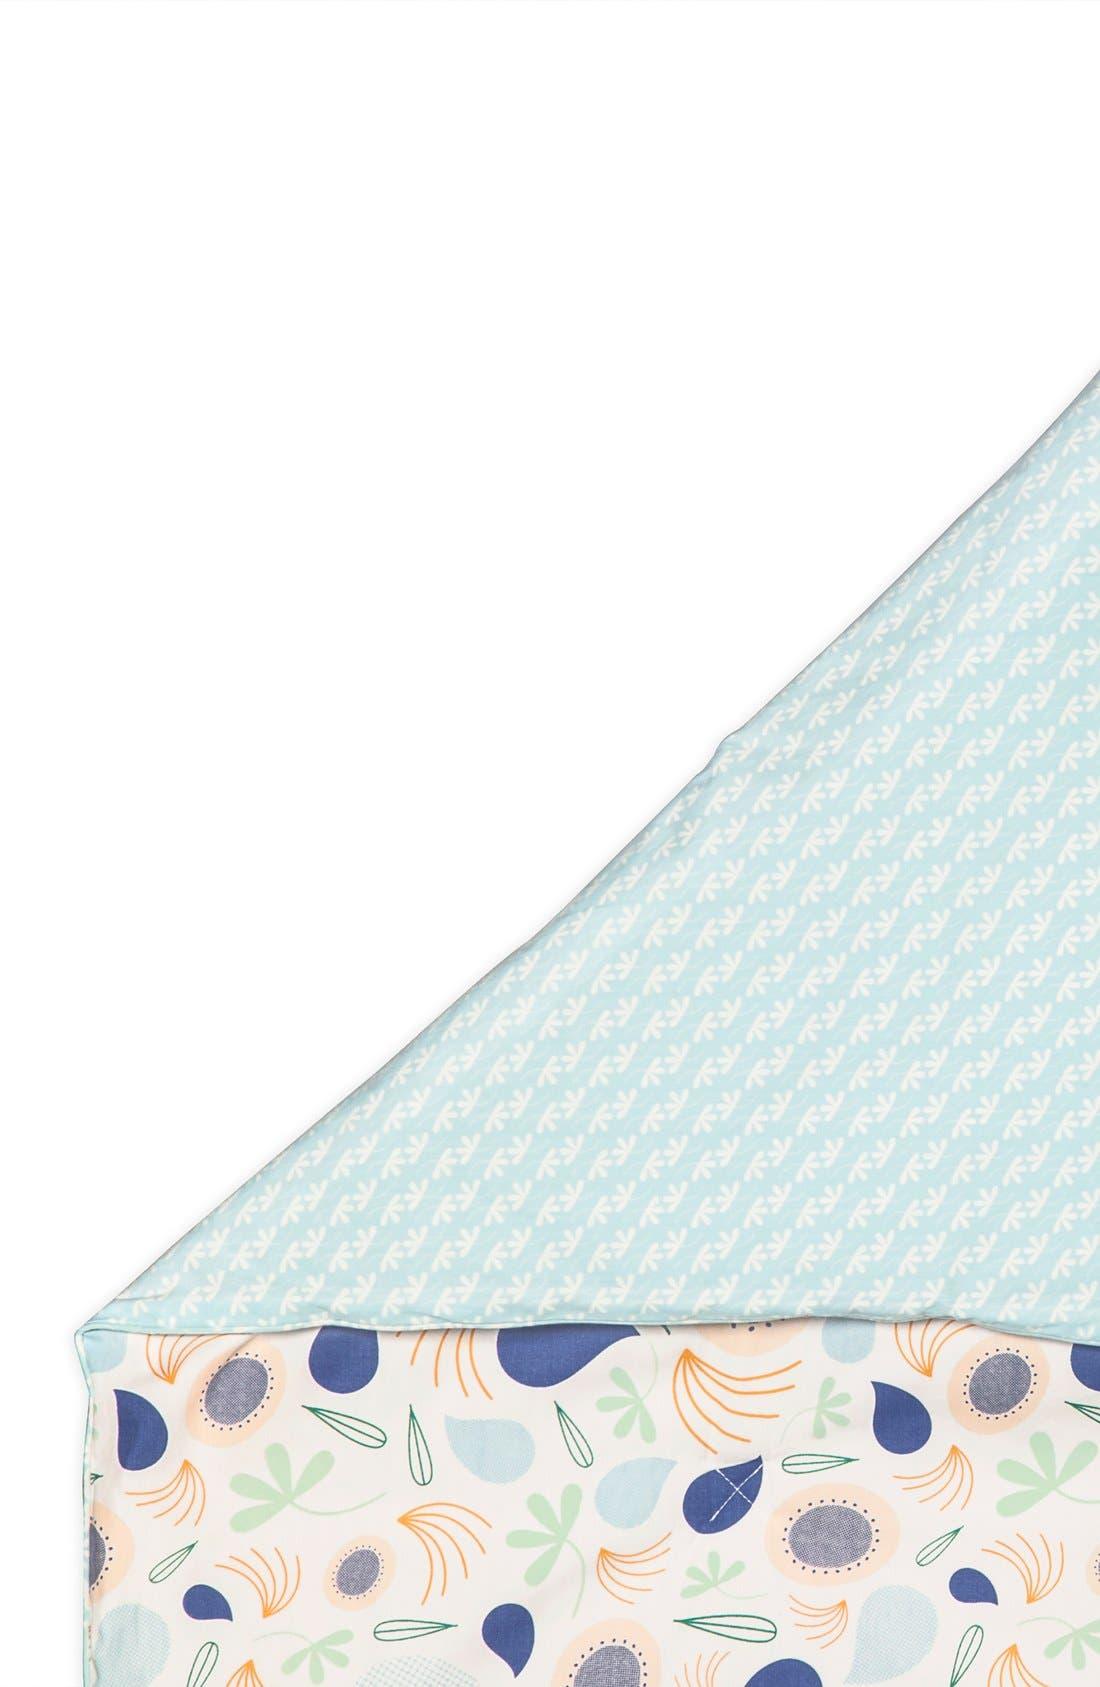 'Flora' Crib Sheet, Crib Skirt, Contour Changing Pad, Play Blanket, Stroller Blanket & Wall Decals,                             Alternate thumbnail 3, color,                             400